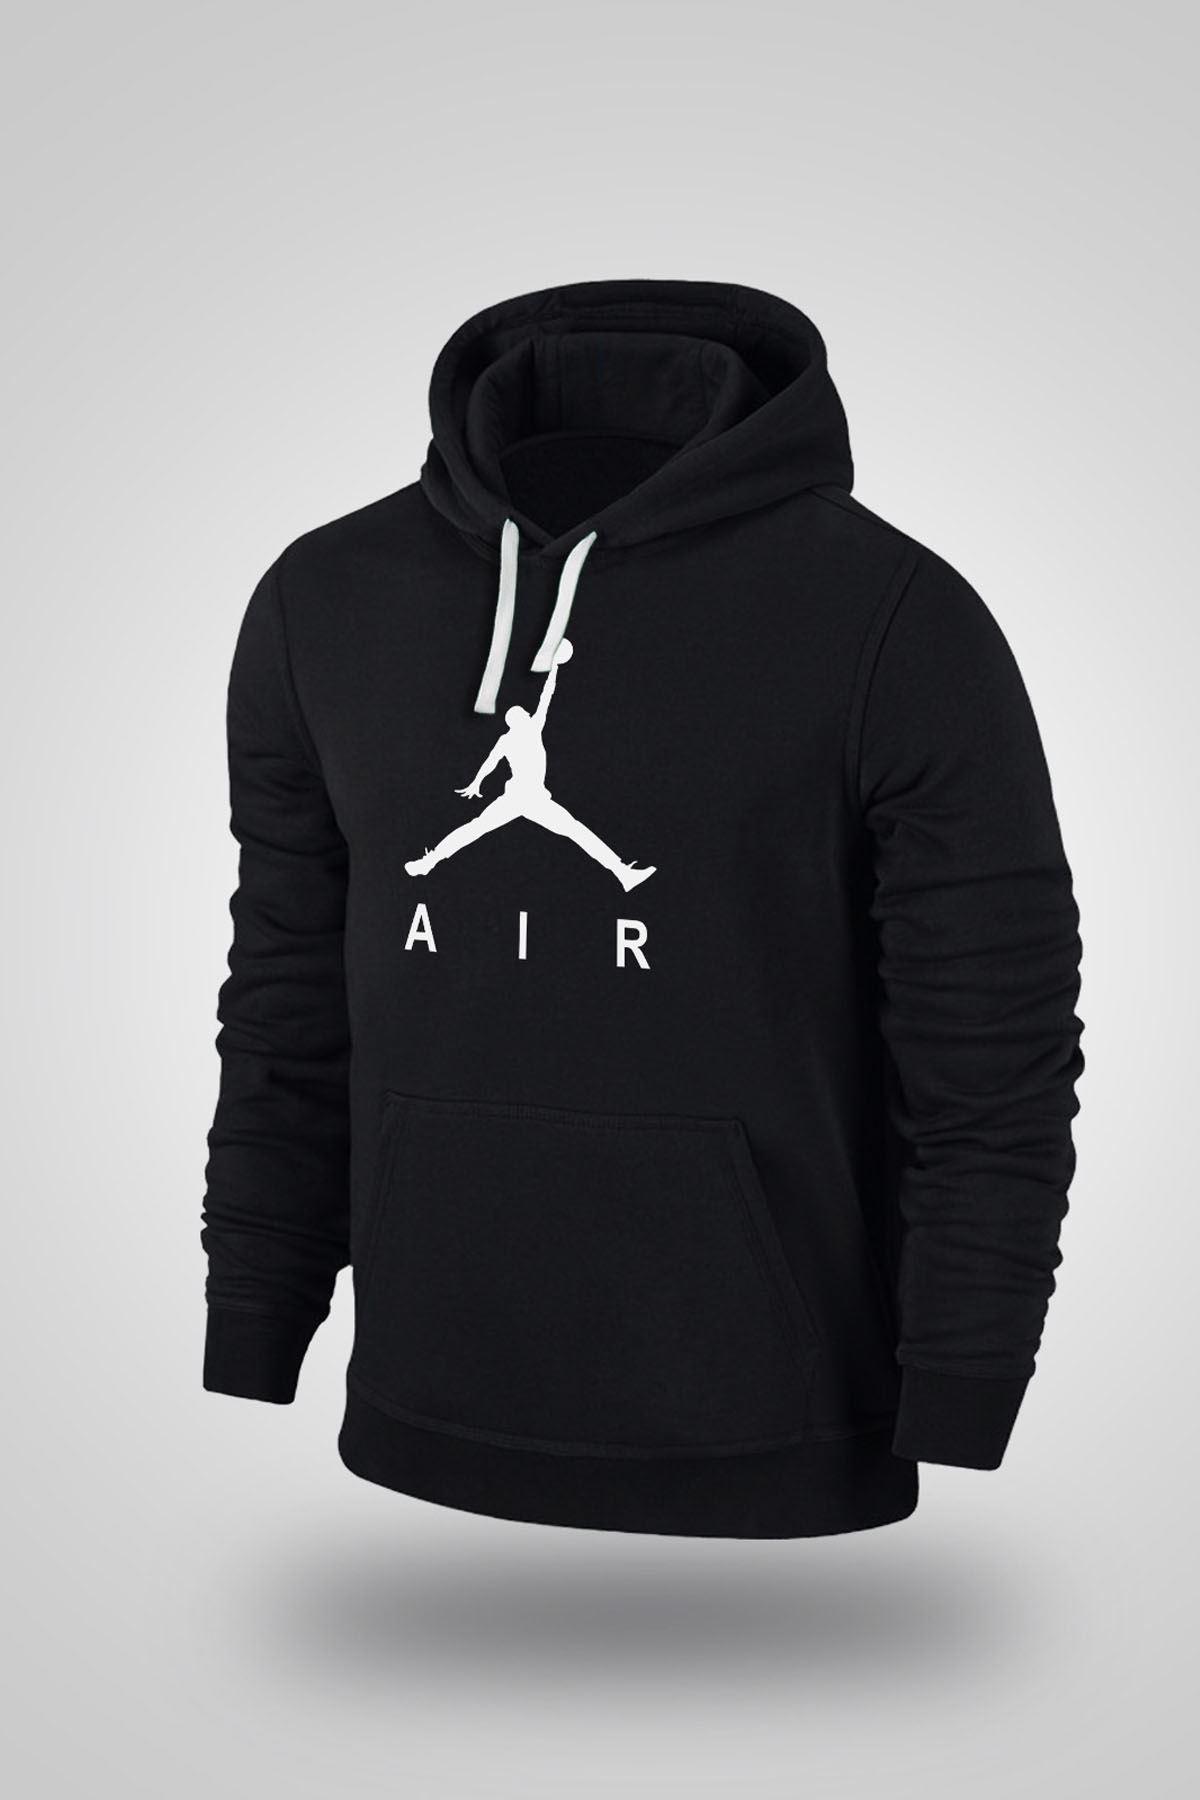 Air Jordan 03 Siyah NBA Erkek Kapşonlu Sweatshirt - Hoodie